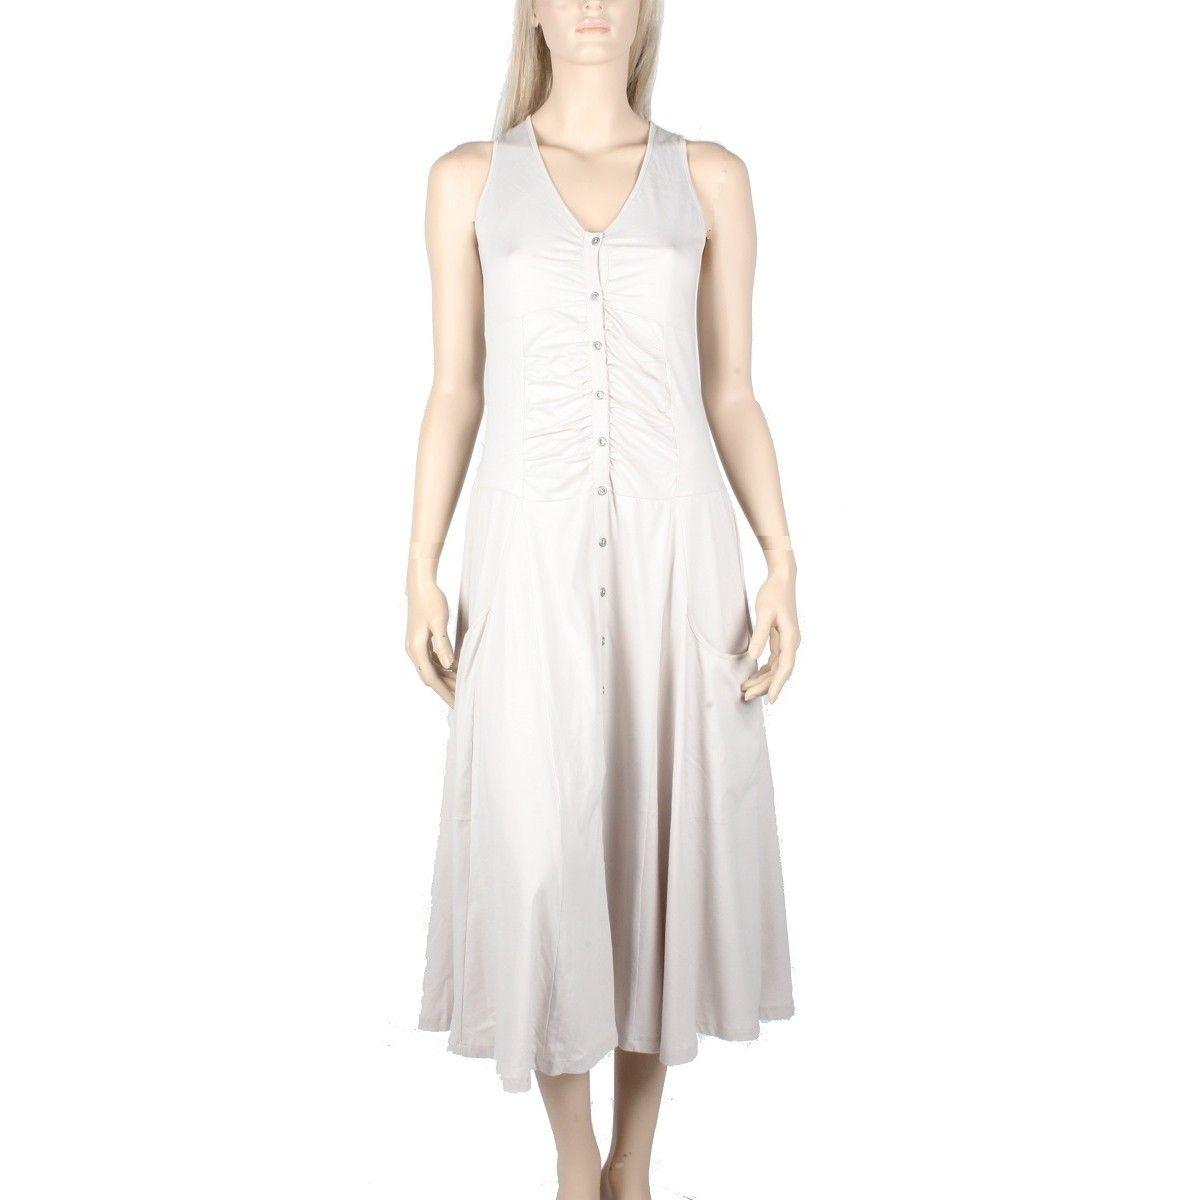 5445ffa6384 Robe femme de la marque maloka Maloka en coton couleur sable modèle nuvem